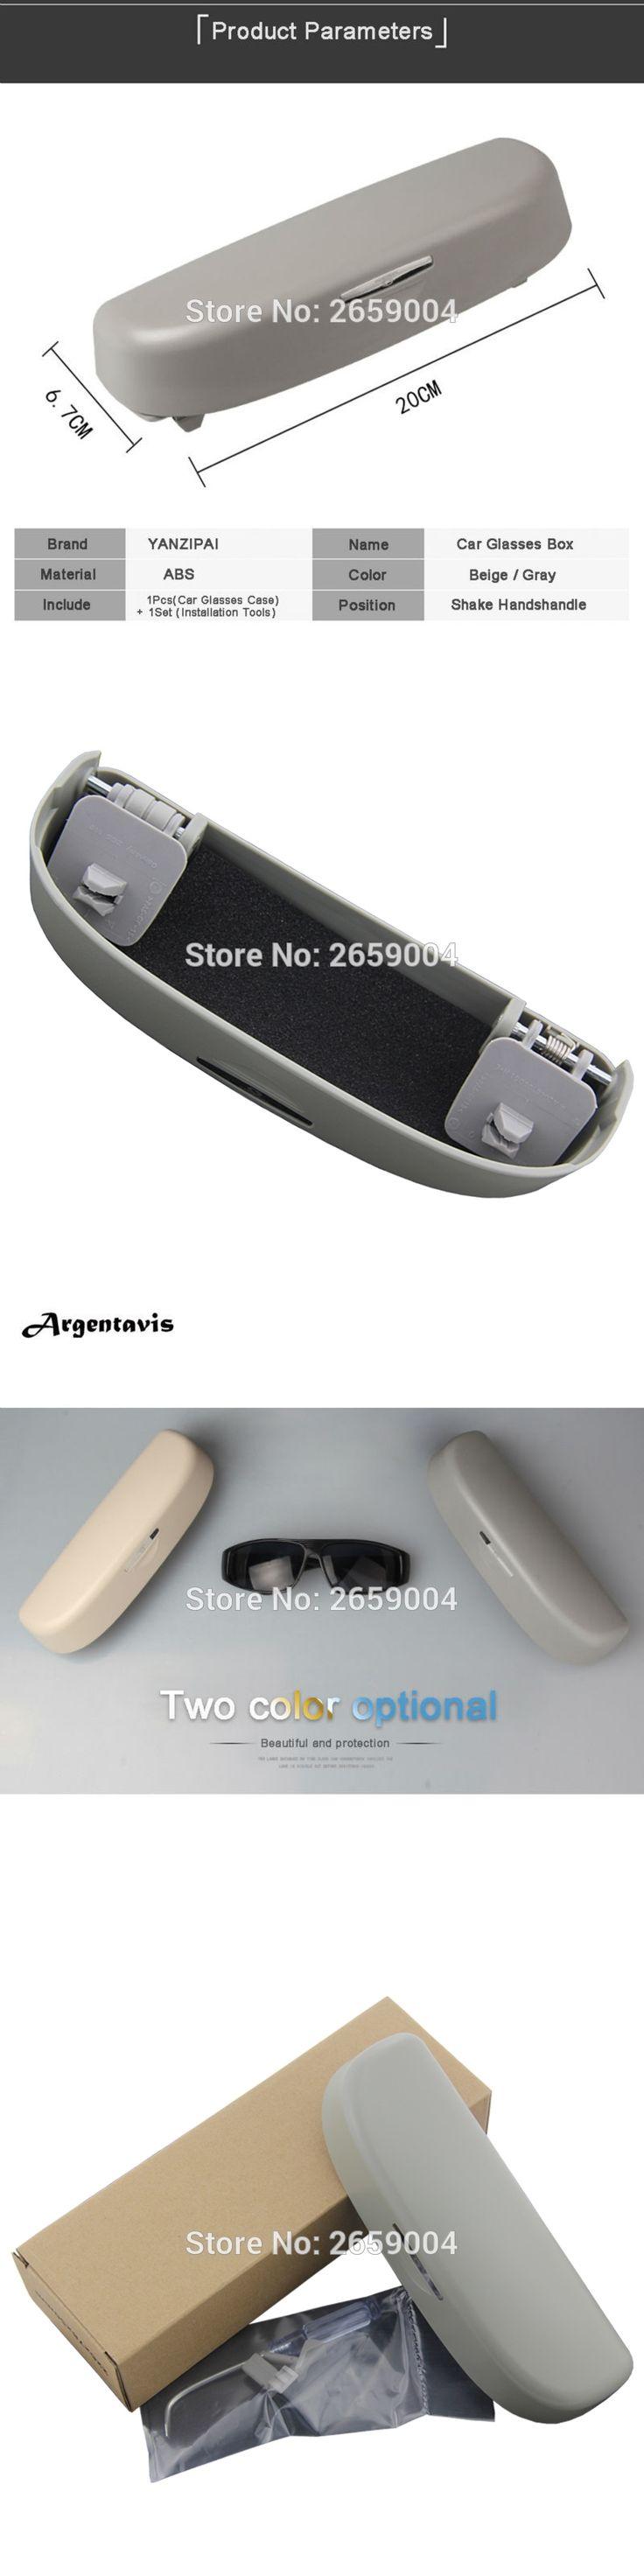 Car Sunglasses Storage Box For Audi A1 A3 A4 A5 A6 A7 A8 A8L Q3 Q5 Q7 S3 S4 S5 S6 S7 S8 TTS RS4 RS5 Auto Accessories